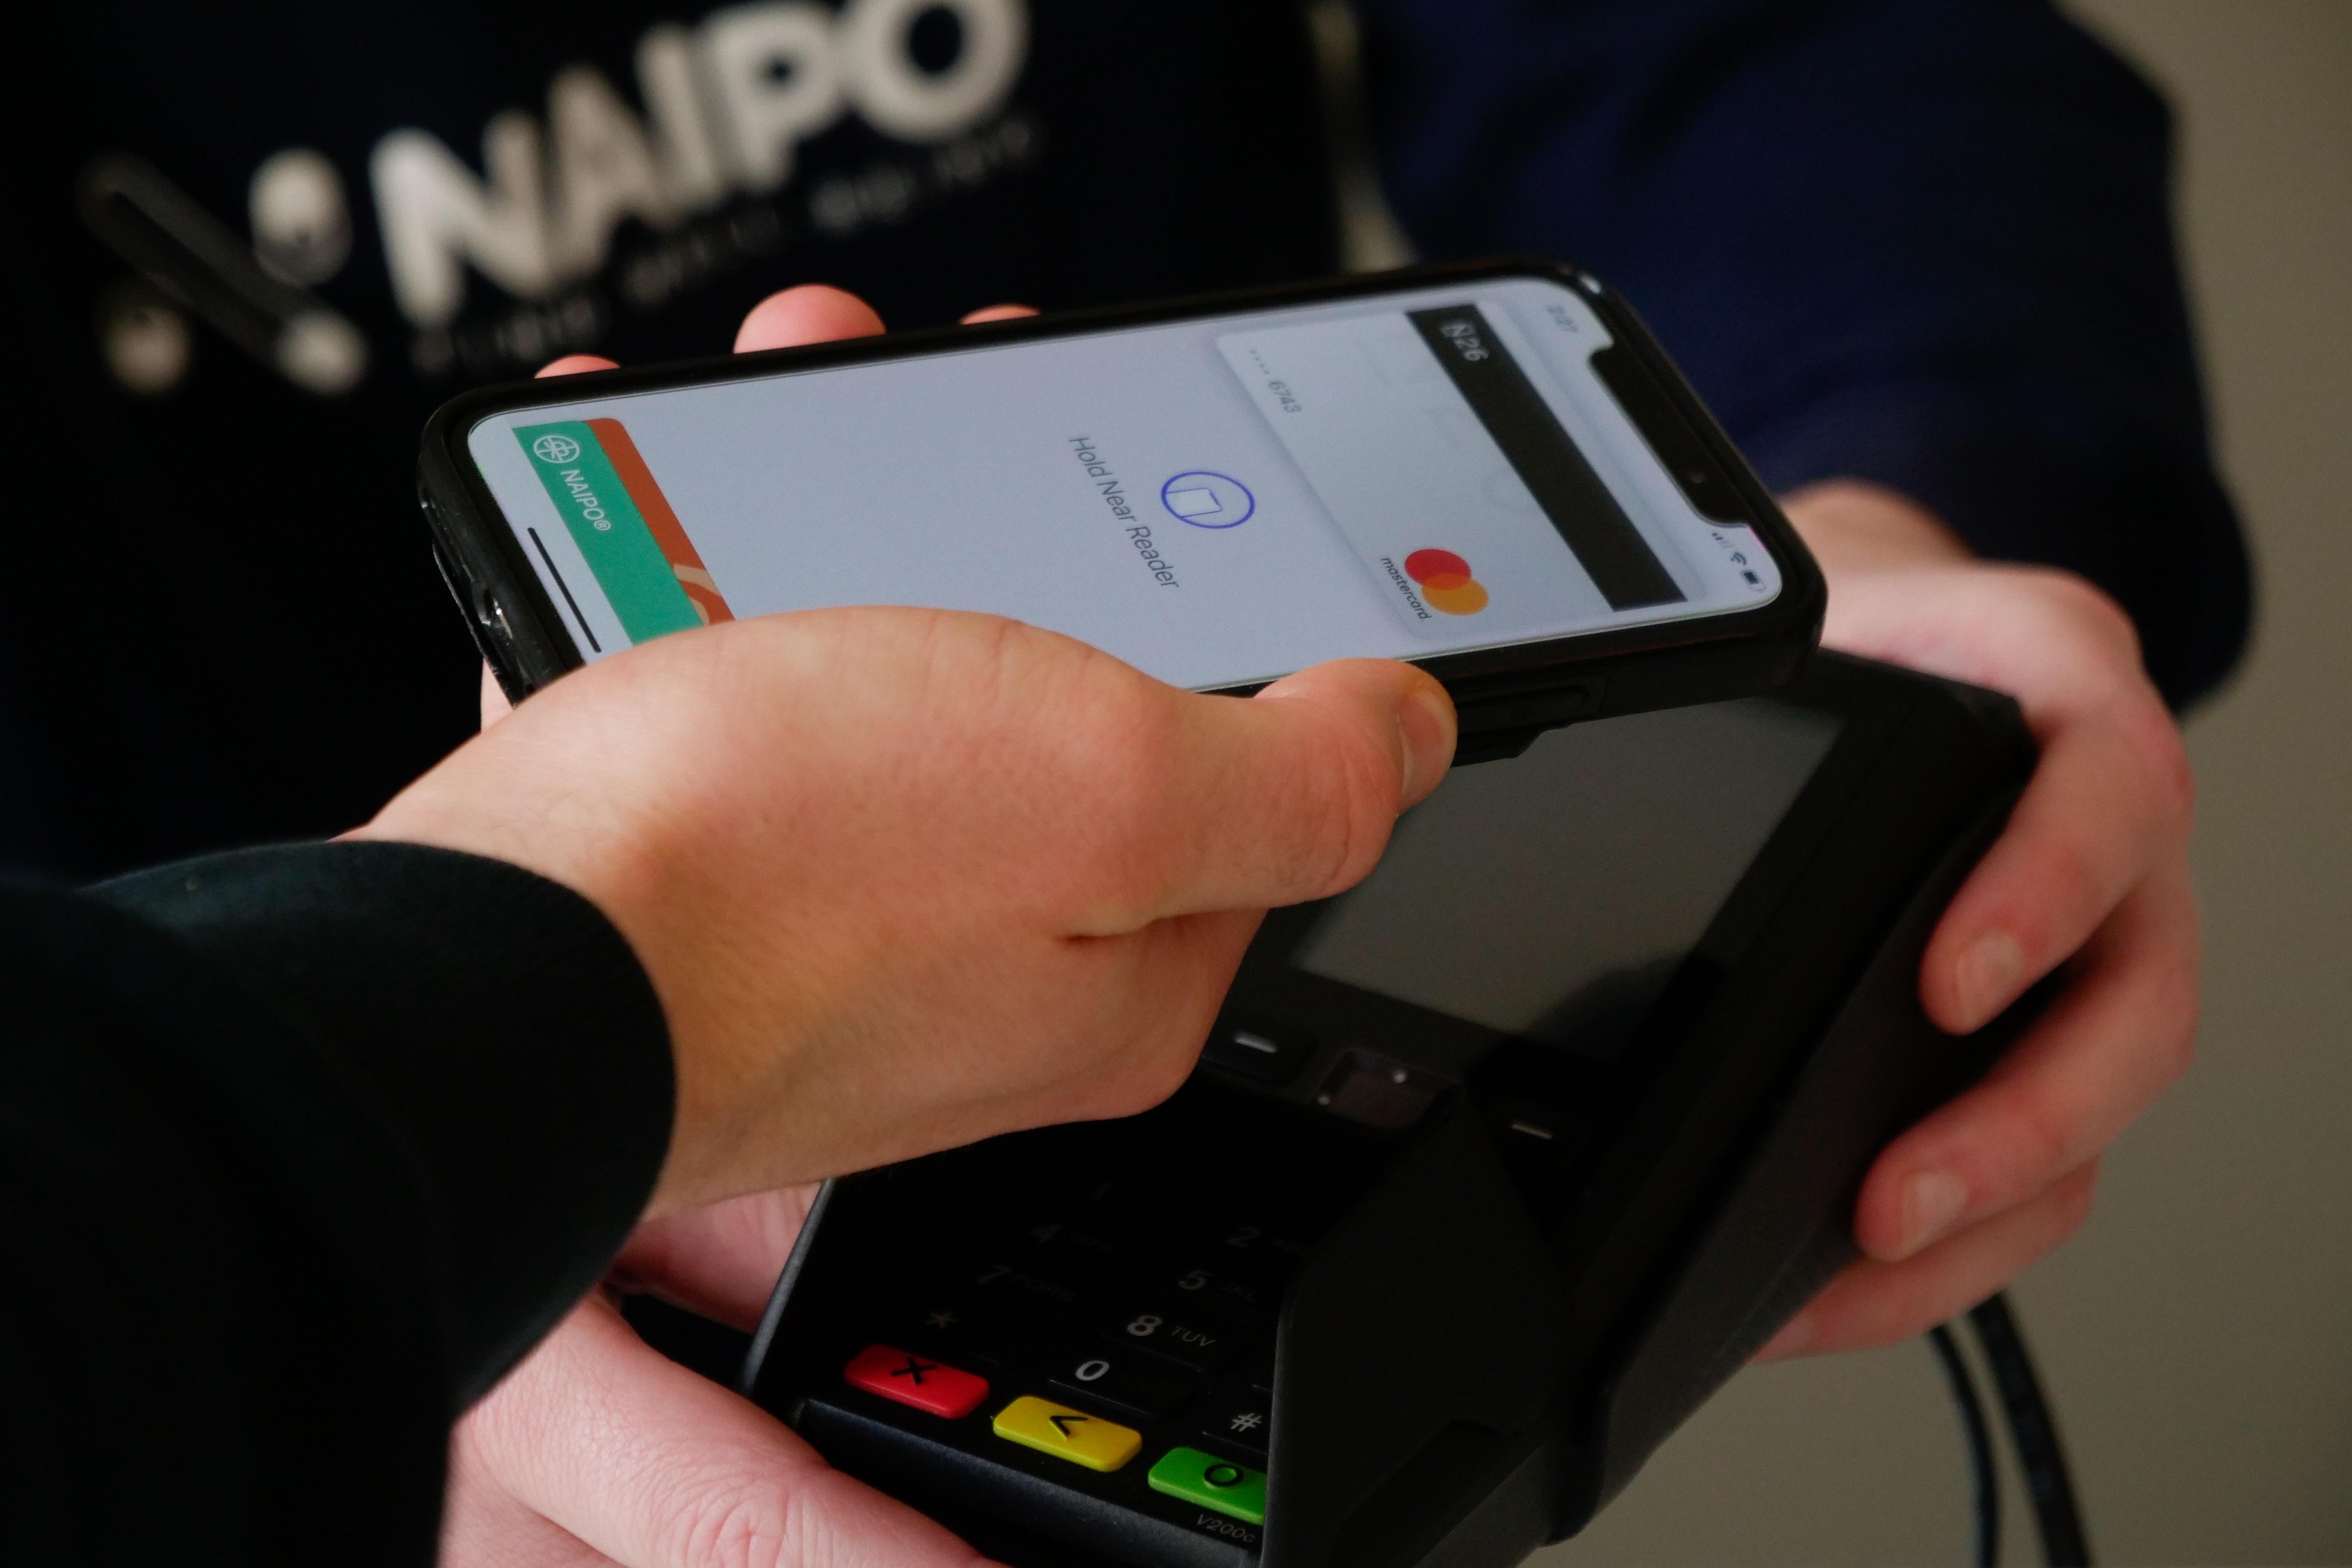 contactless payment via phone